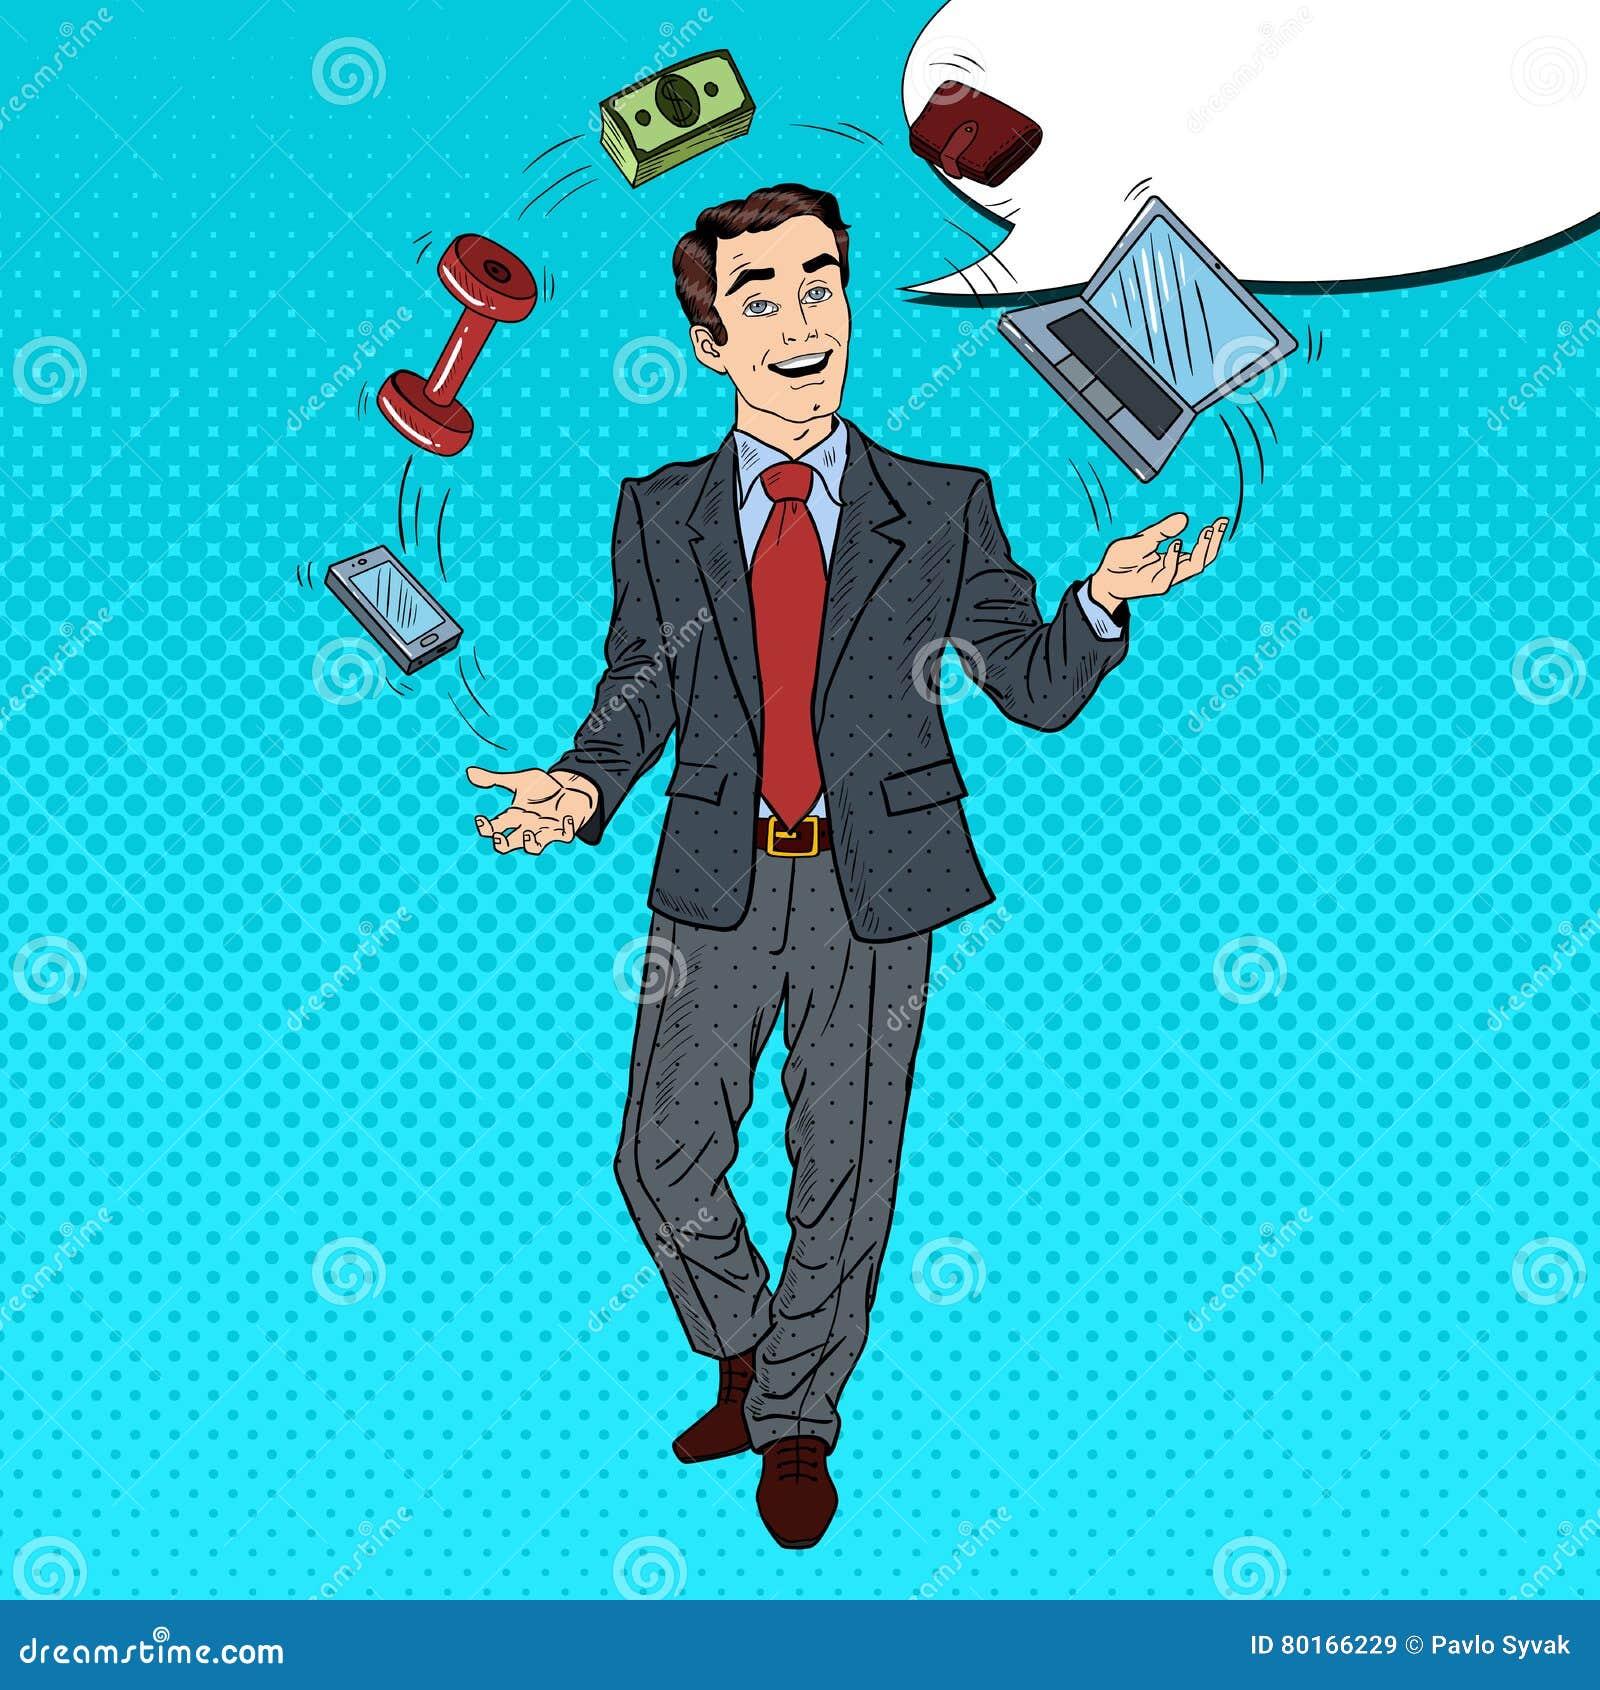 PNF Art Successful Businessman Juggling Computer, telefone e dinheiro